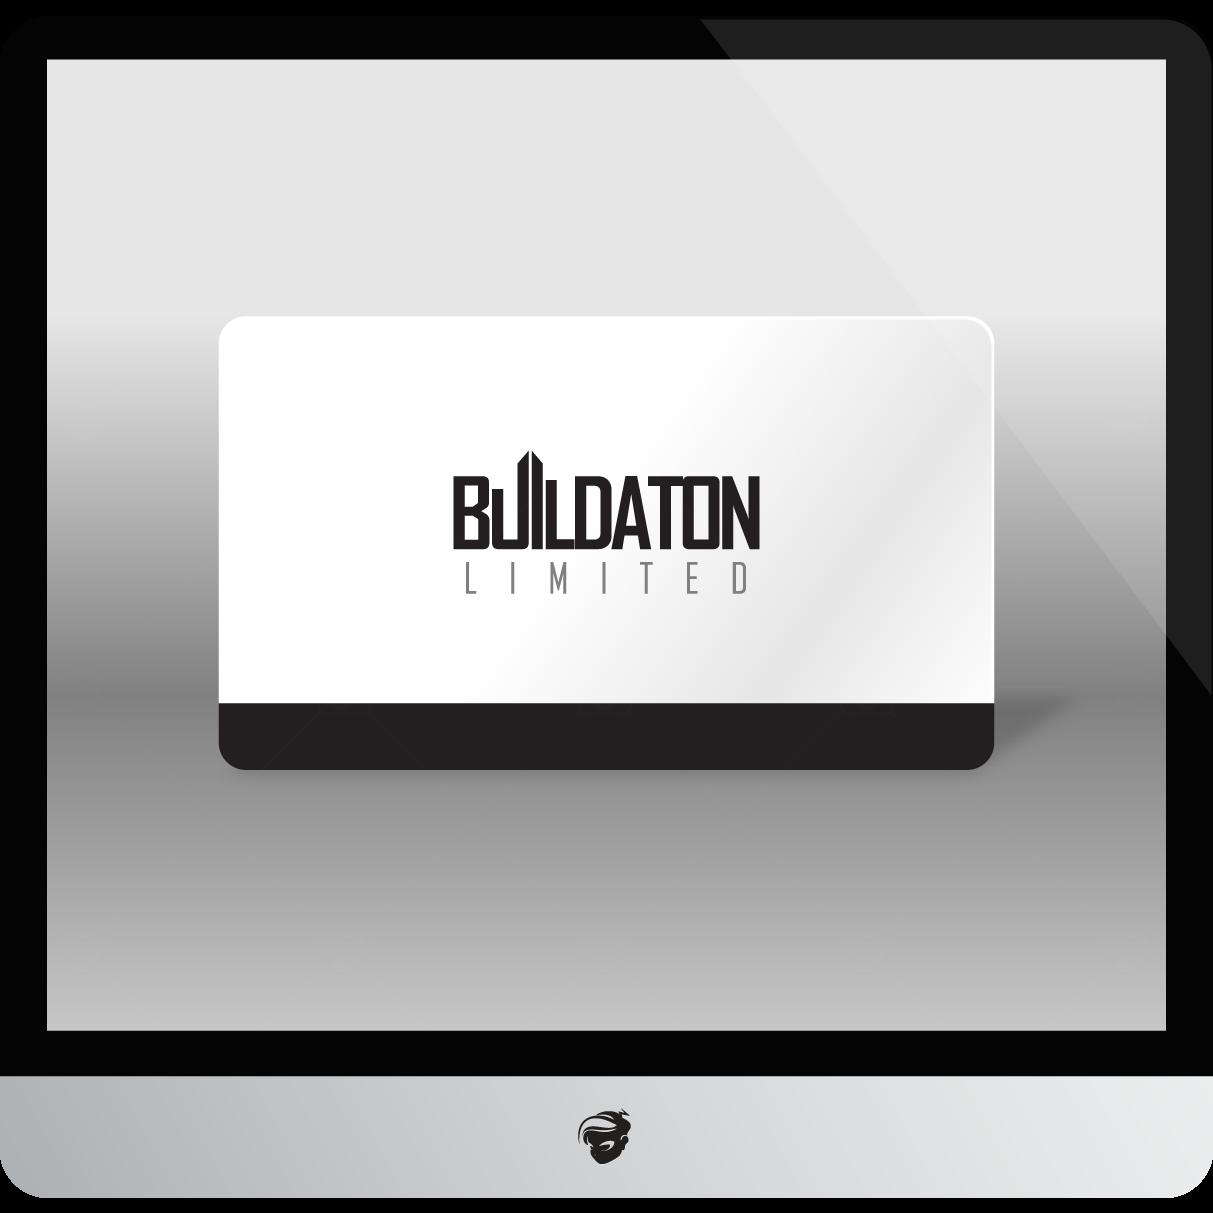 Logo Design by zesthar - Entry No. 85 in the Logo Design Contest Artistic Logo Design for Buildaton Limited.